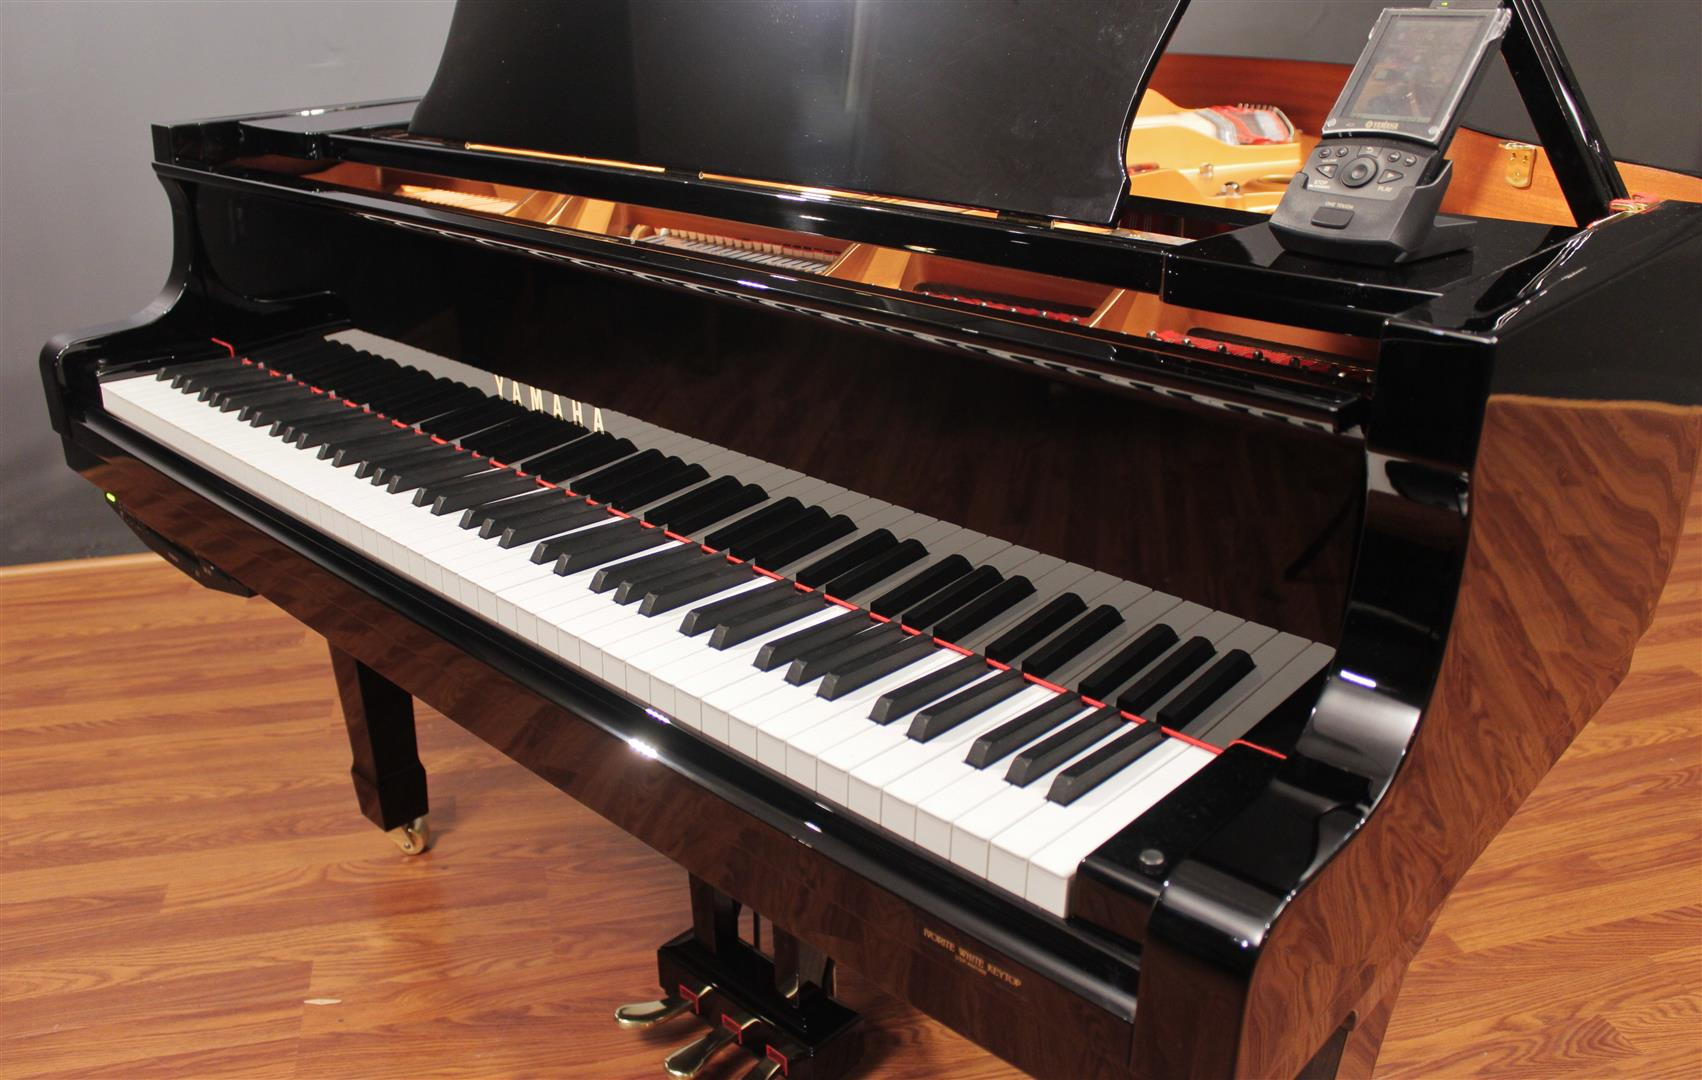 Yamaha disklavier c3 mark iv 6 39 1 39 39 grand piano 2008 dc3m4 for Yamaha pianos dc